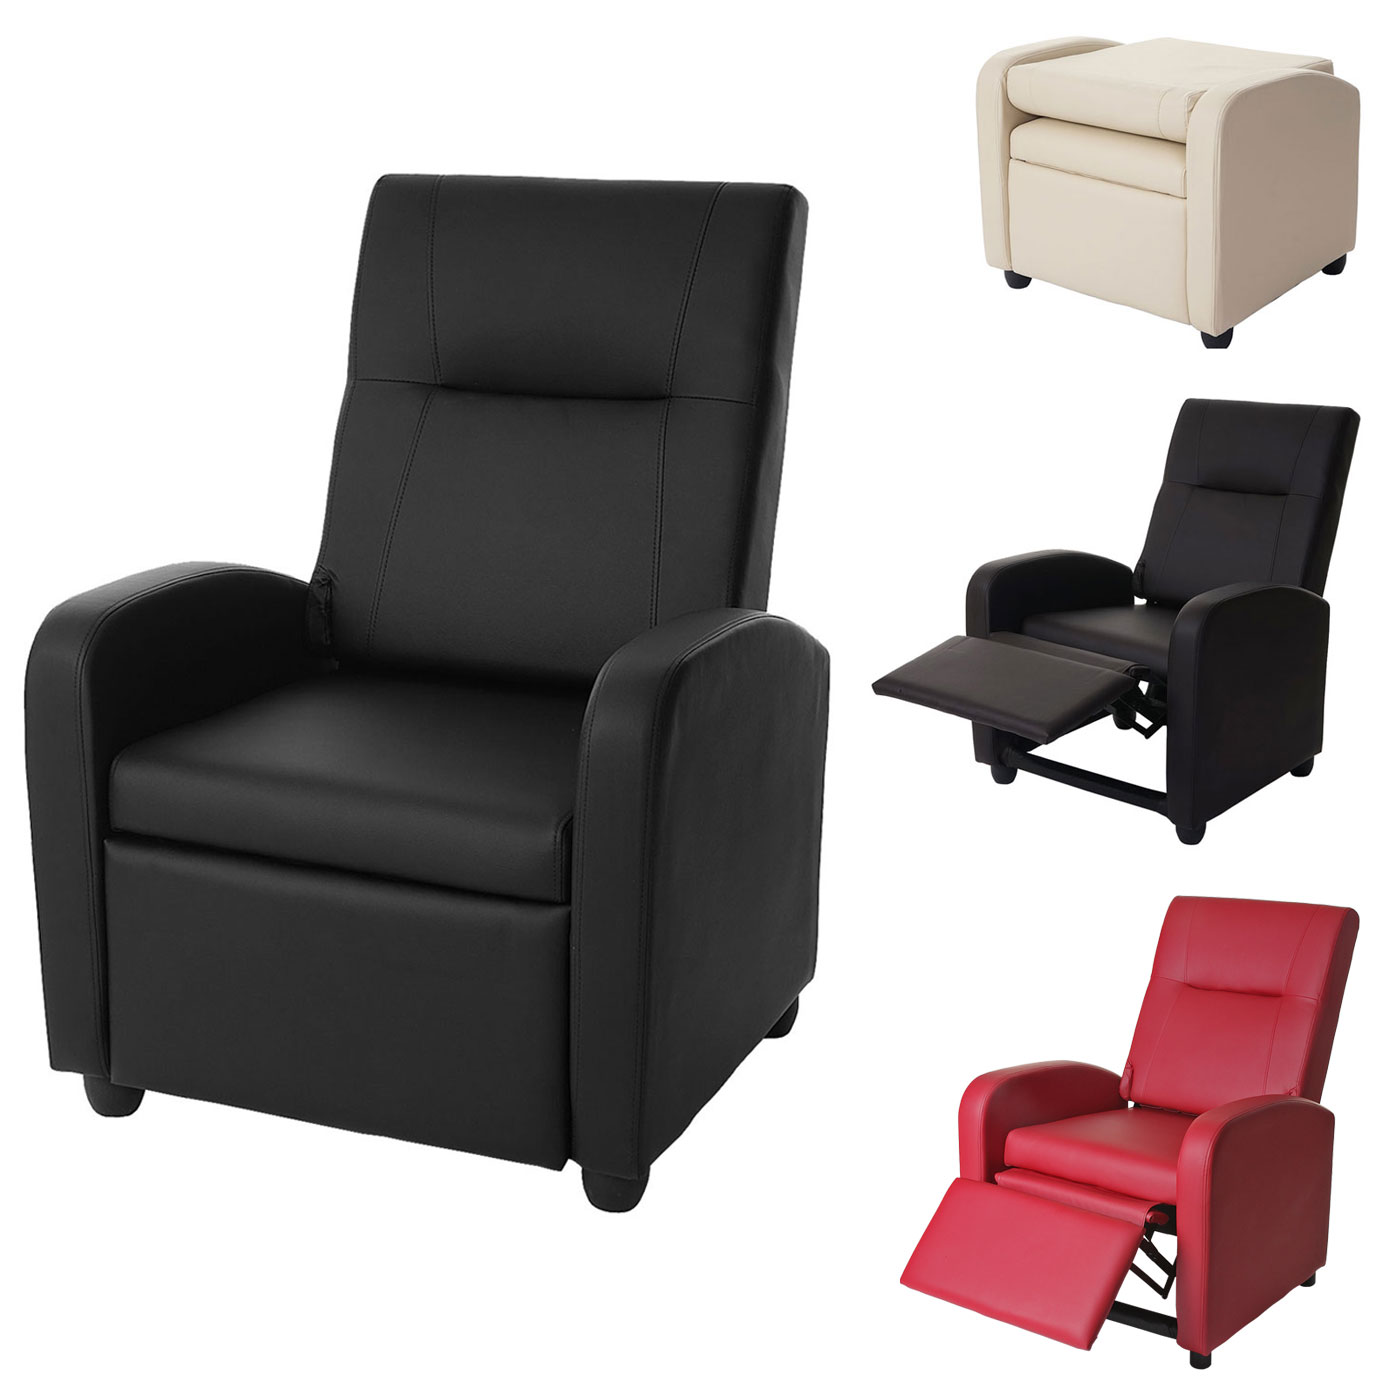 fernsehsessel denver basic relaxsessel relaxliege sessel kunstleder ebay. Black Bedroom Furniture Sets. Home Design Ideas